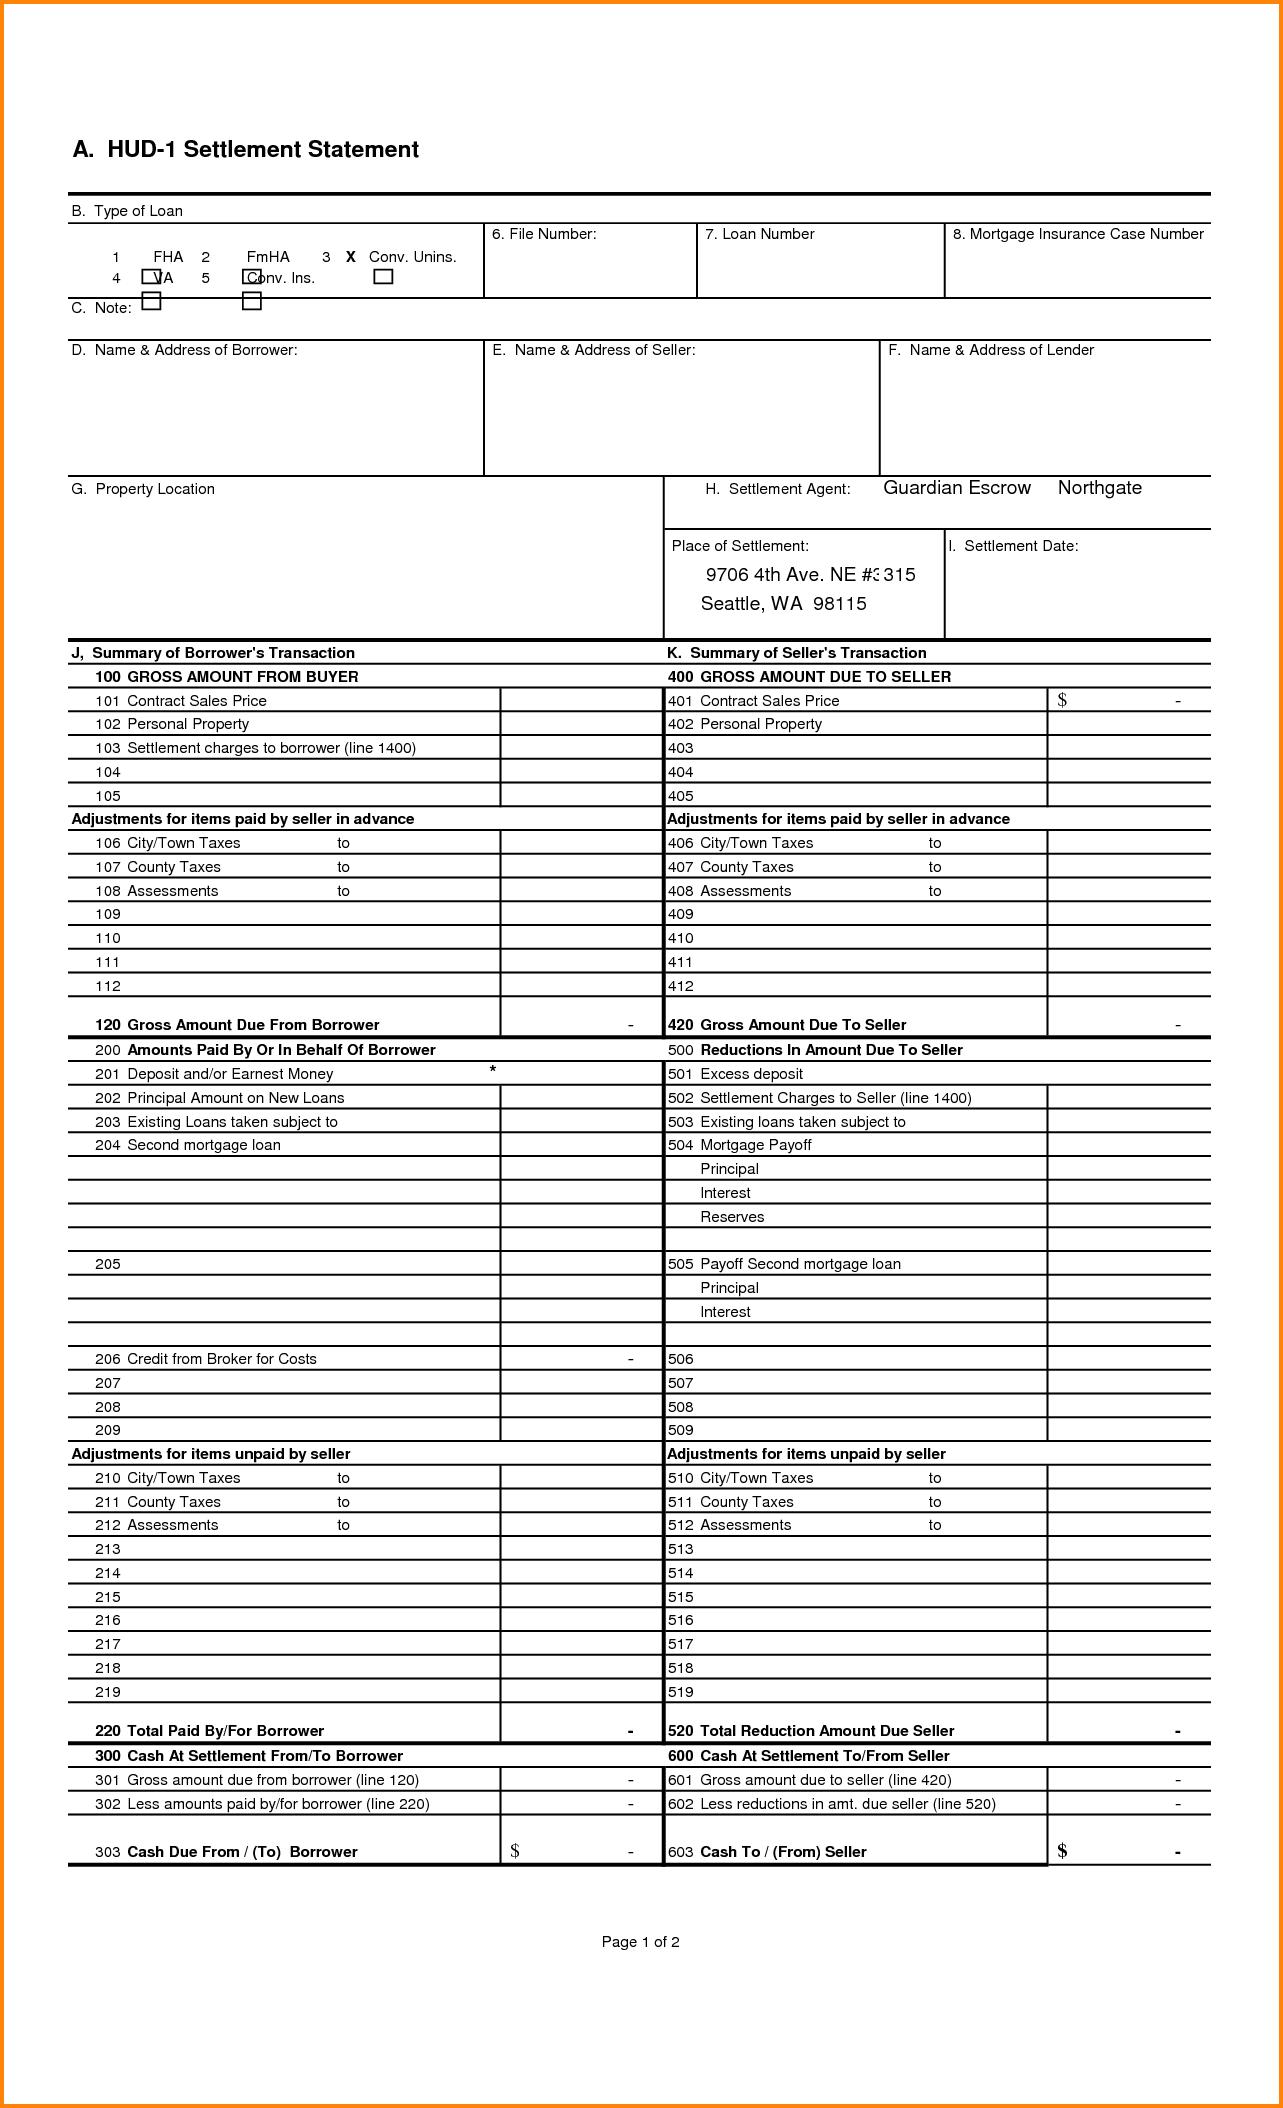 Sample Hud 1 Settlement Statement and 7 Hud 1 Settlement Statement Authorization Letter